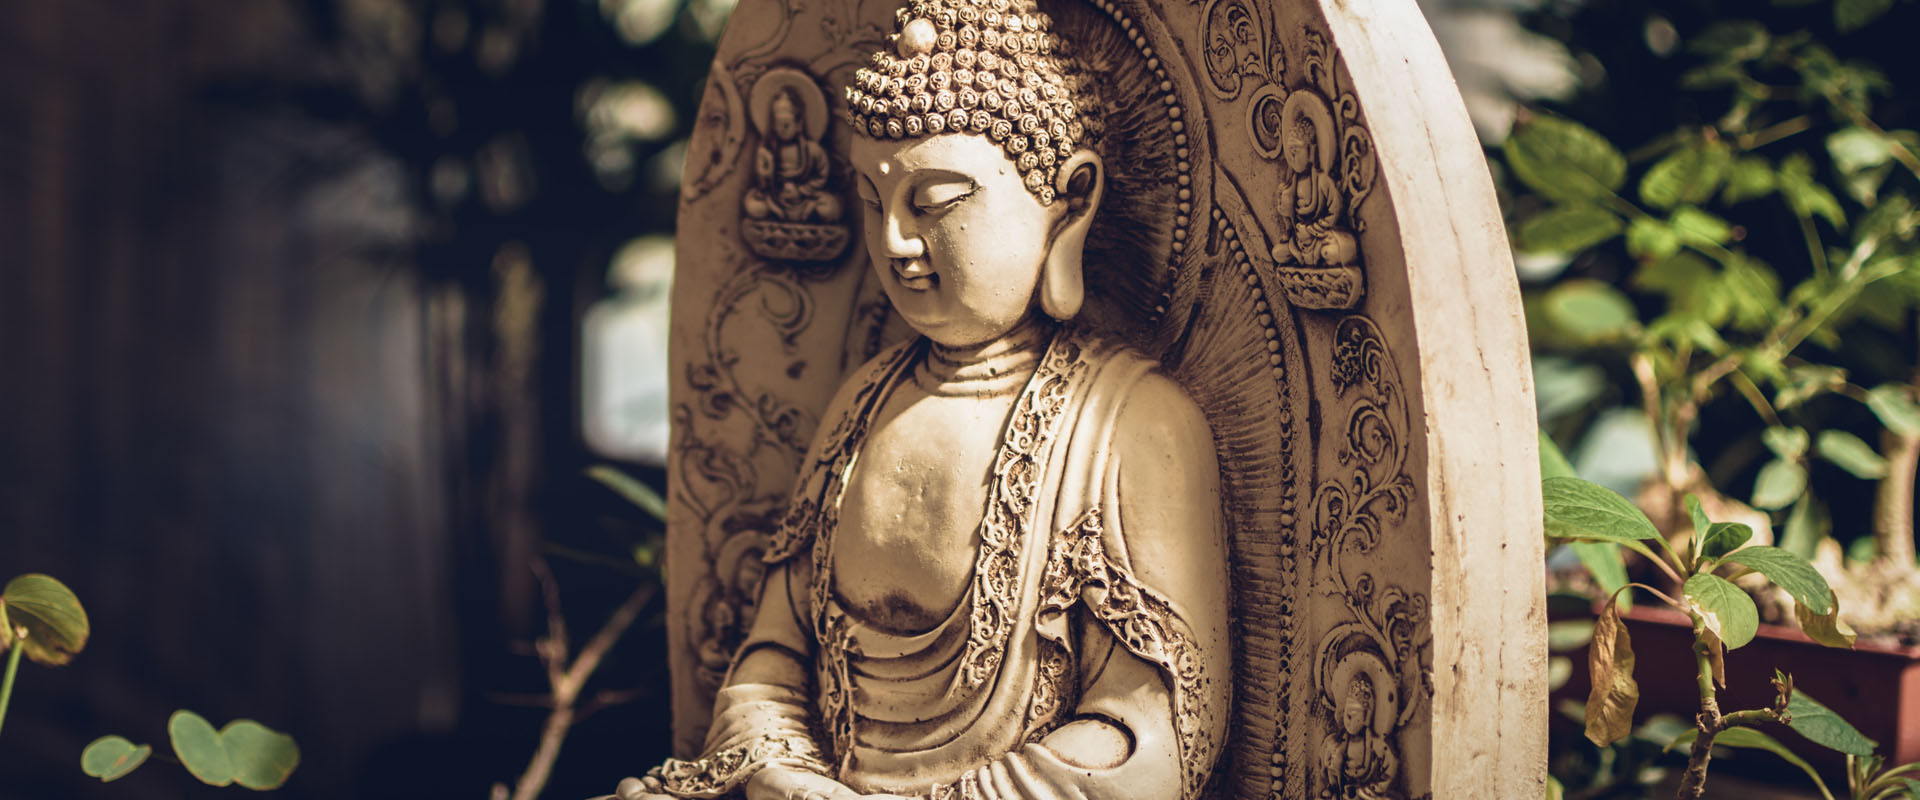 Gautama statue in garden